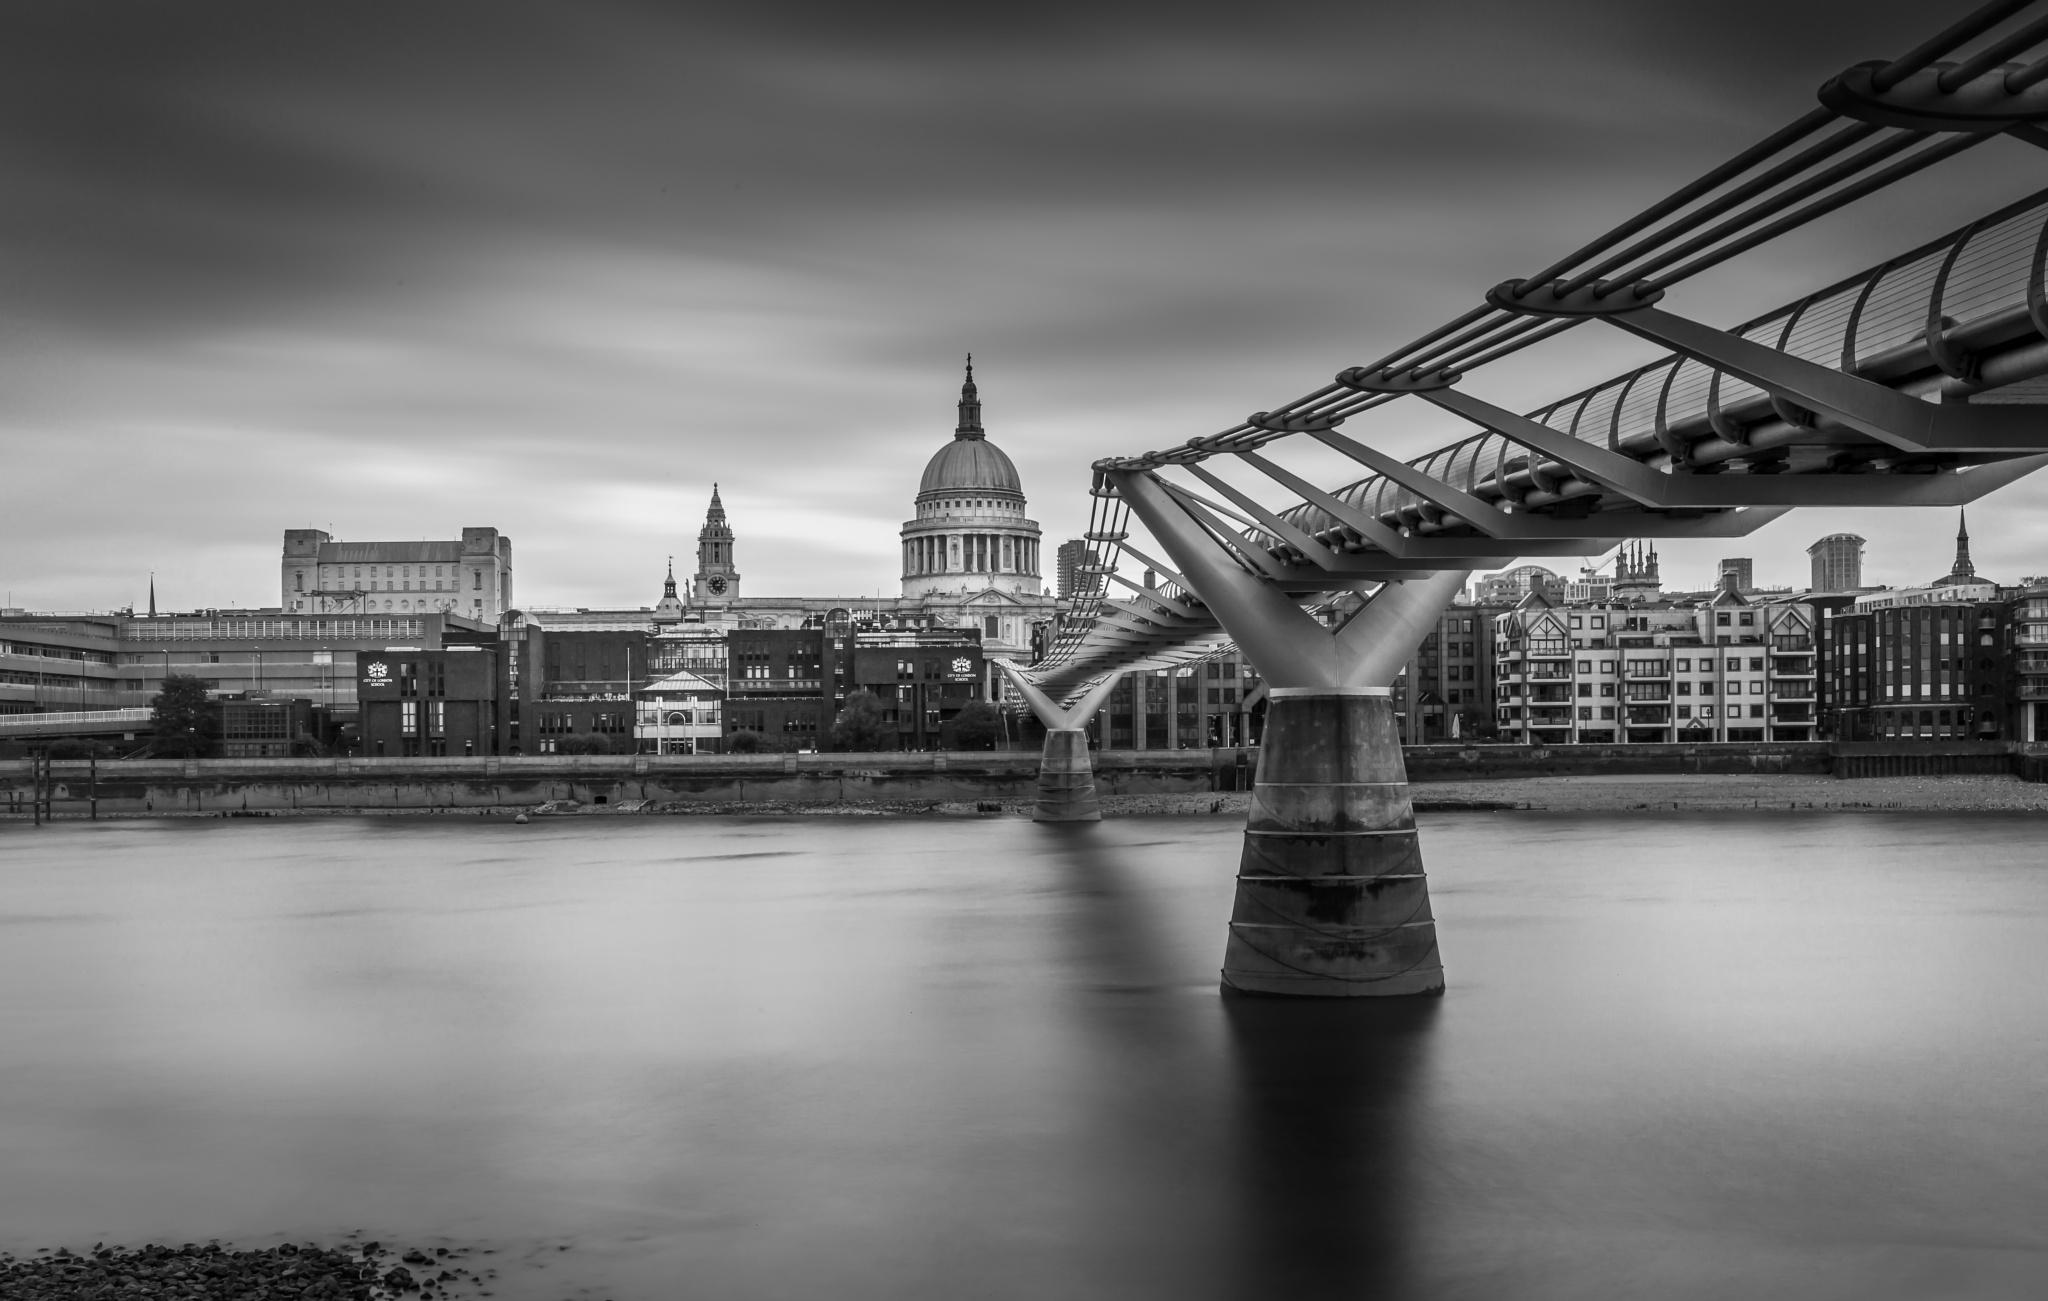 Bridge over still water by Chris Lee